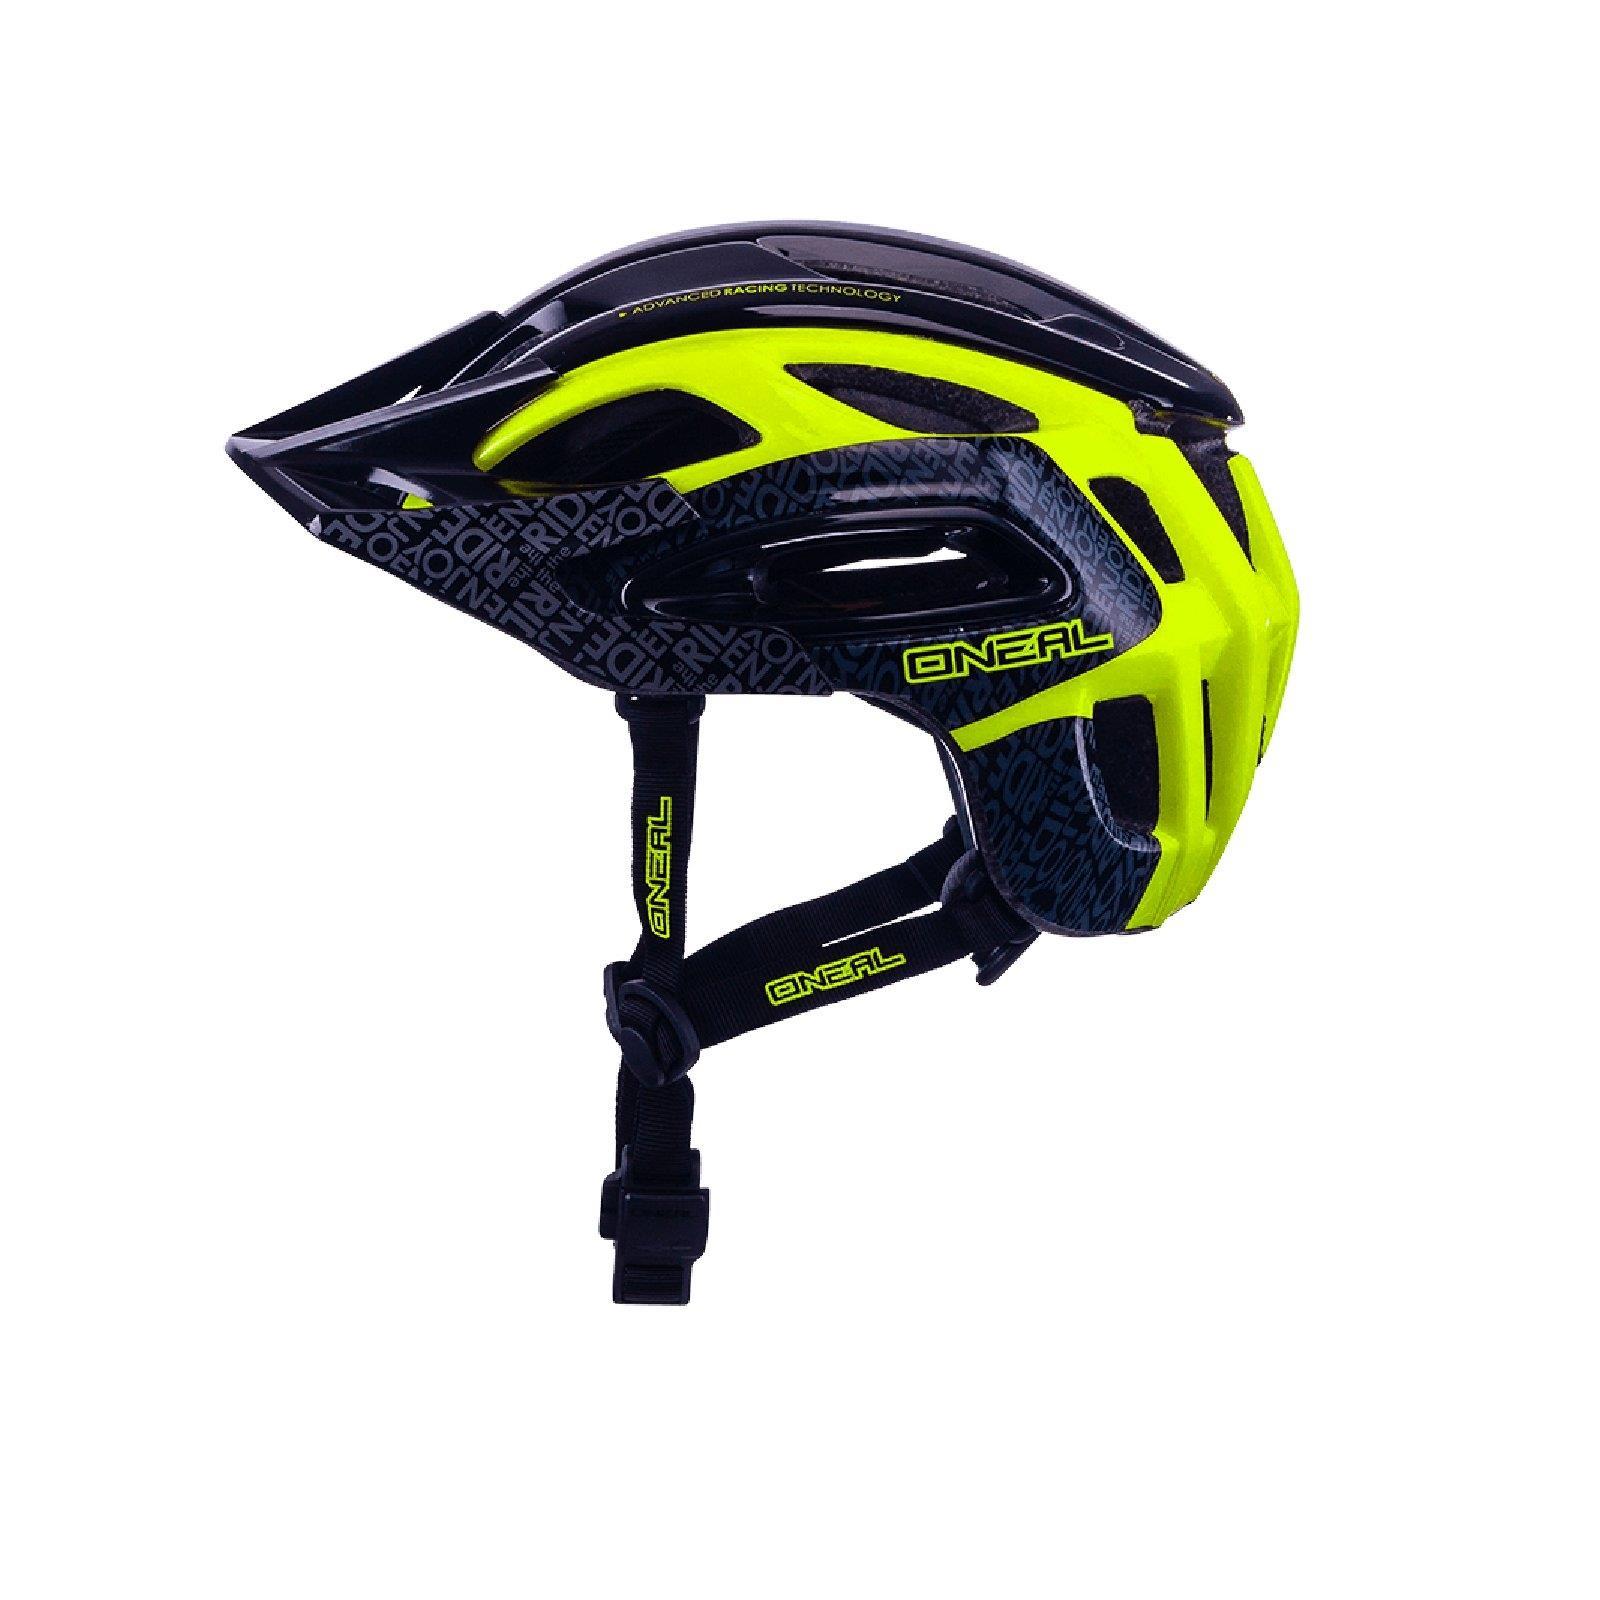 oneal orbiter ii fahrrad helm schwarz gelb mtb all. Black Bedroom Furniture Sets. Home Design Ideas